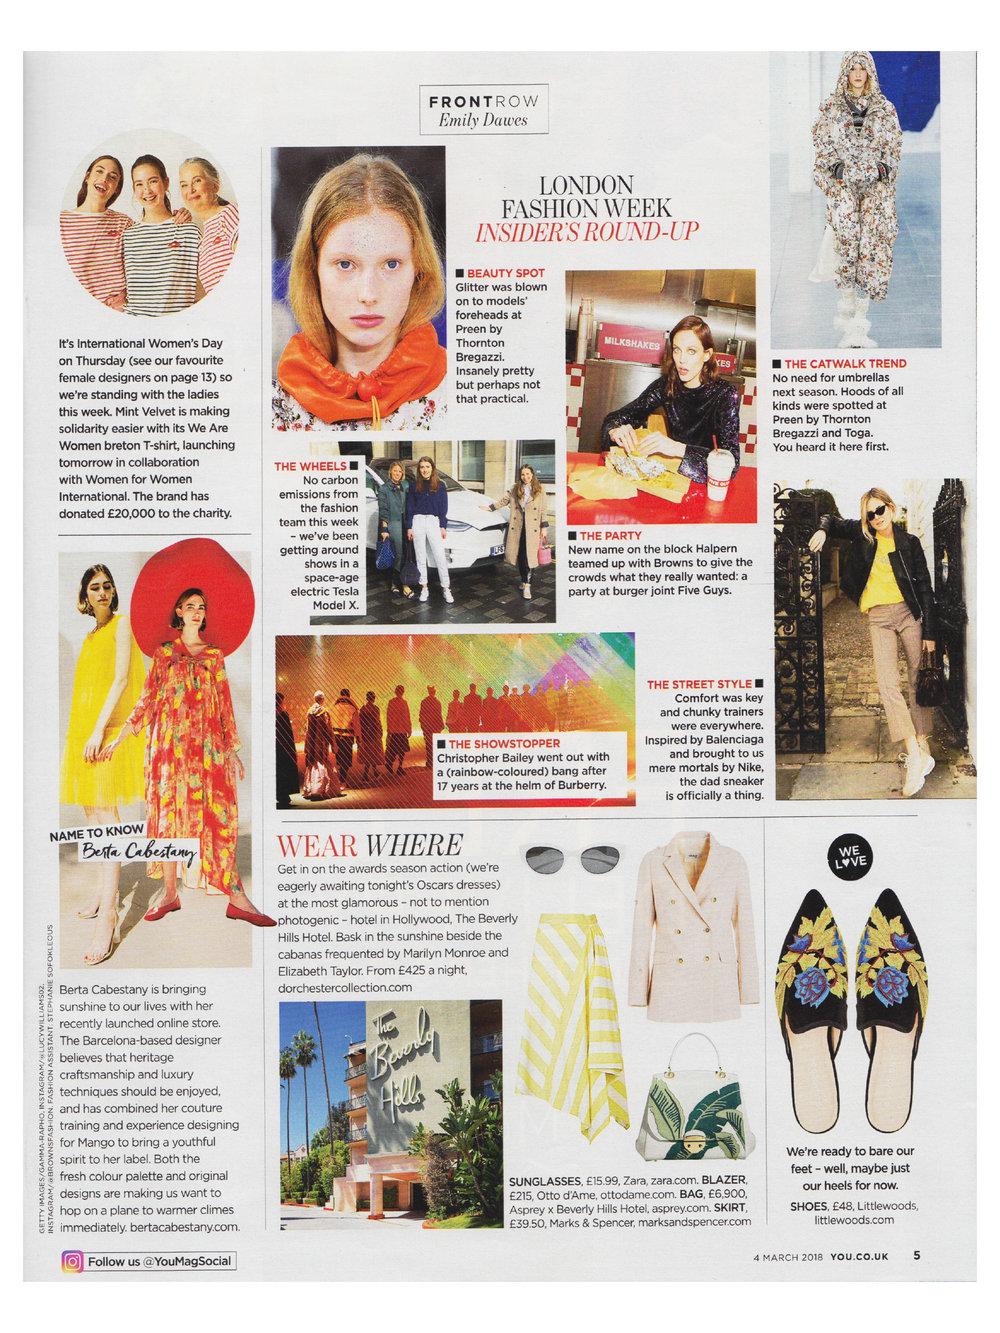 180306 - Berta Cabestany - You Magazine - 6 March.jpg